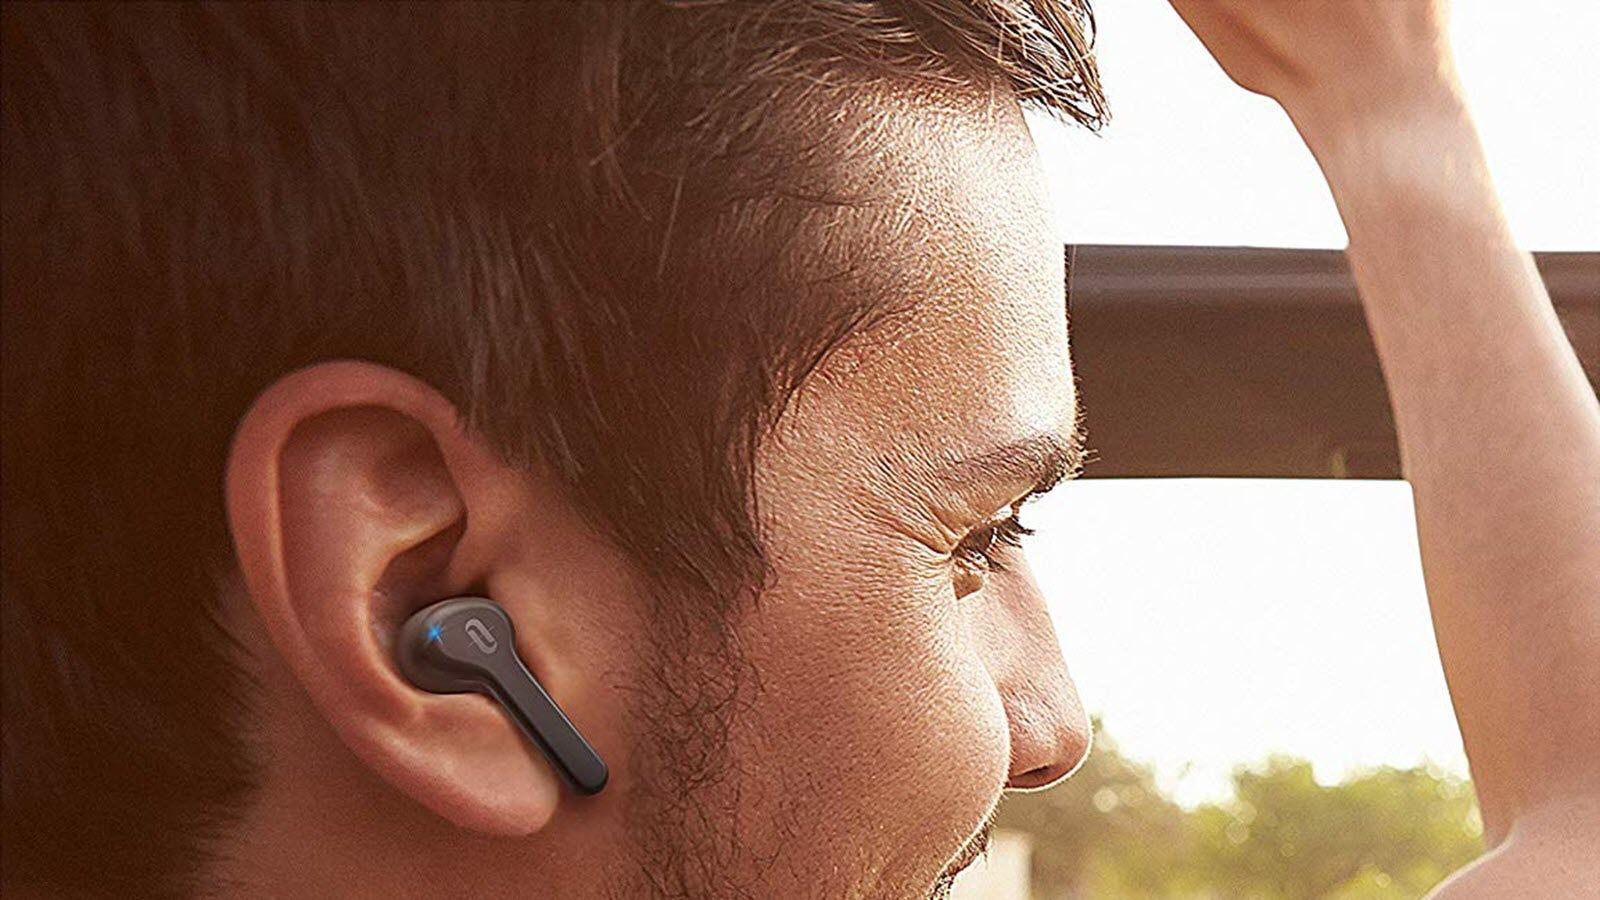 A TaoTronics SoundLiberty 53 earbud in a man's ear.